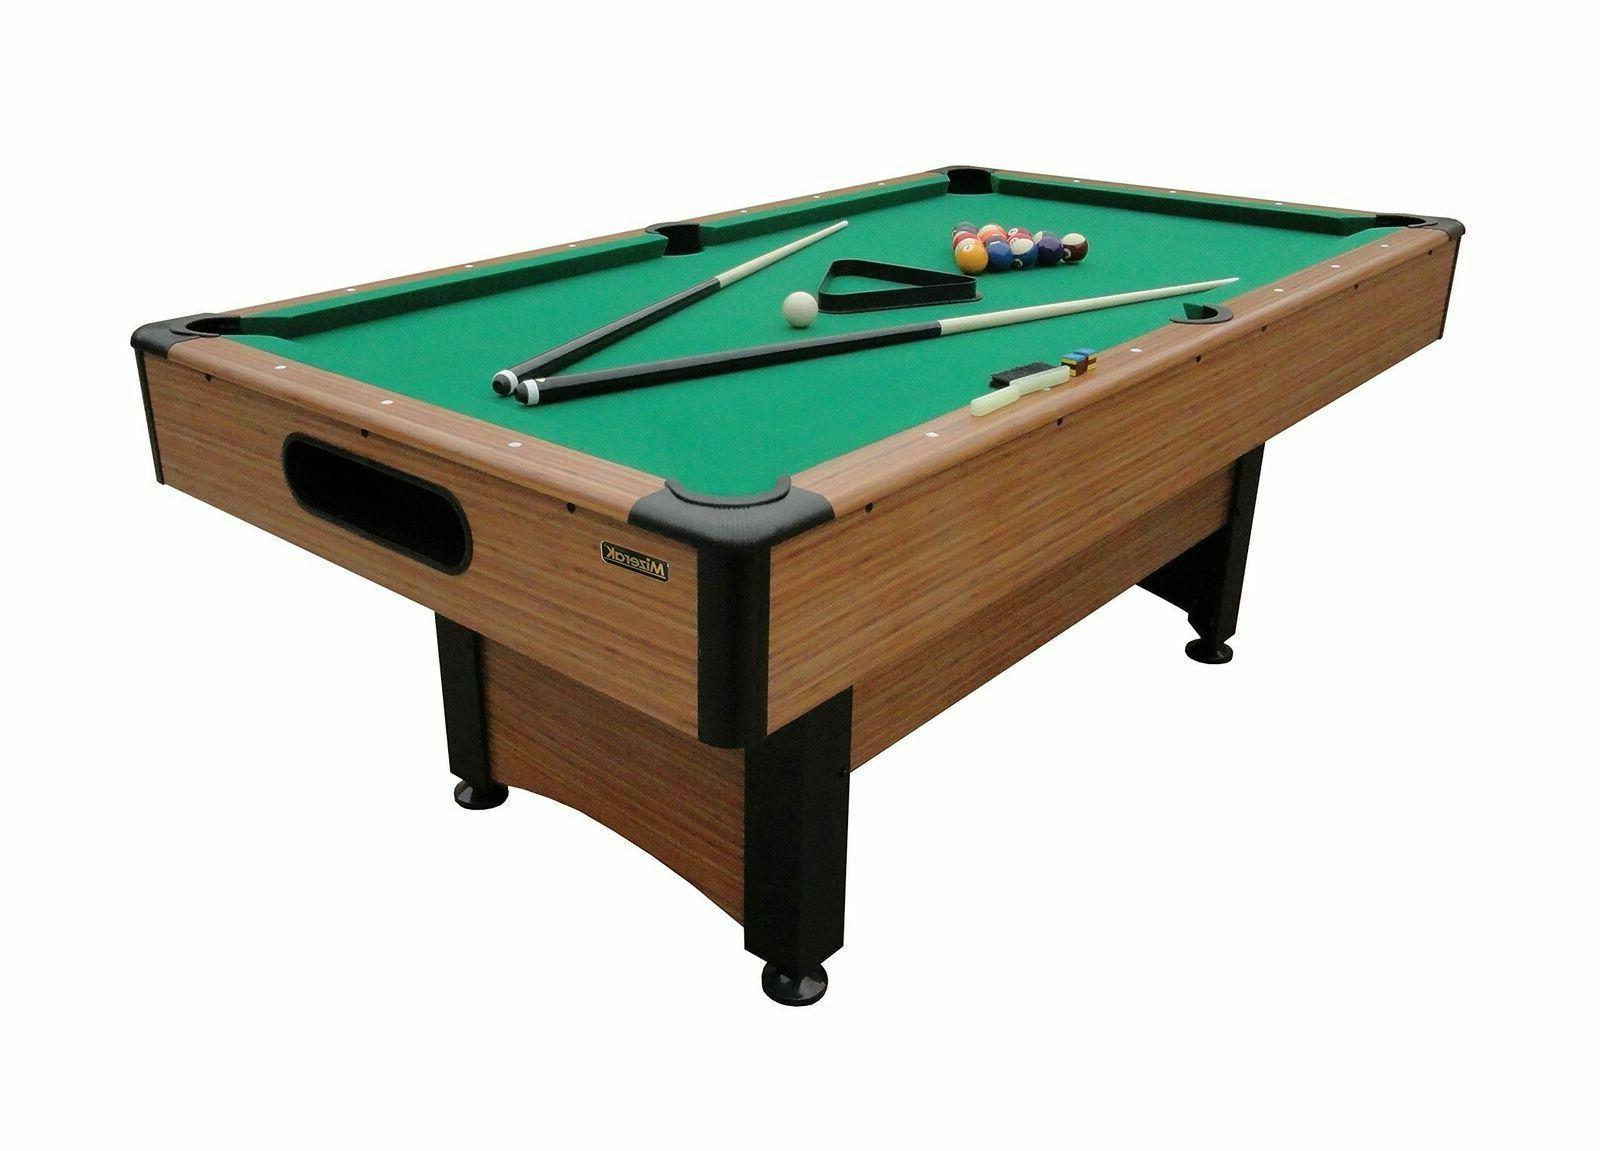 Mizerak Dynasty Space Saver 6.5' Billiard Table with Compa